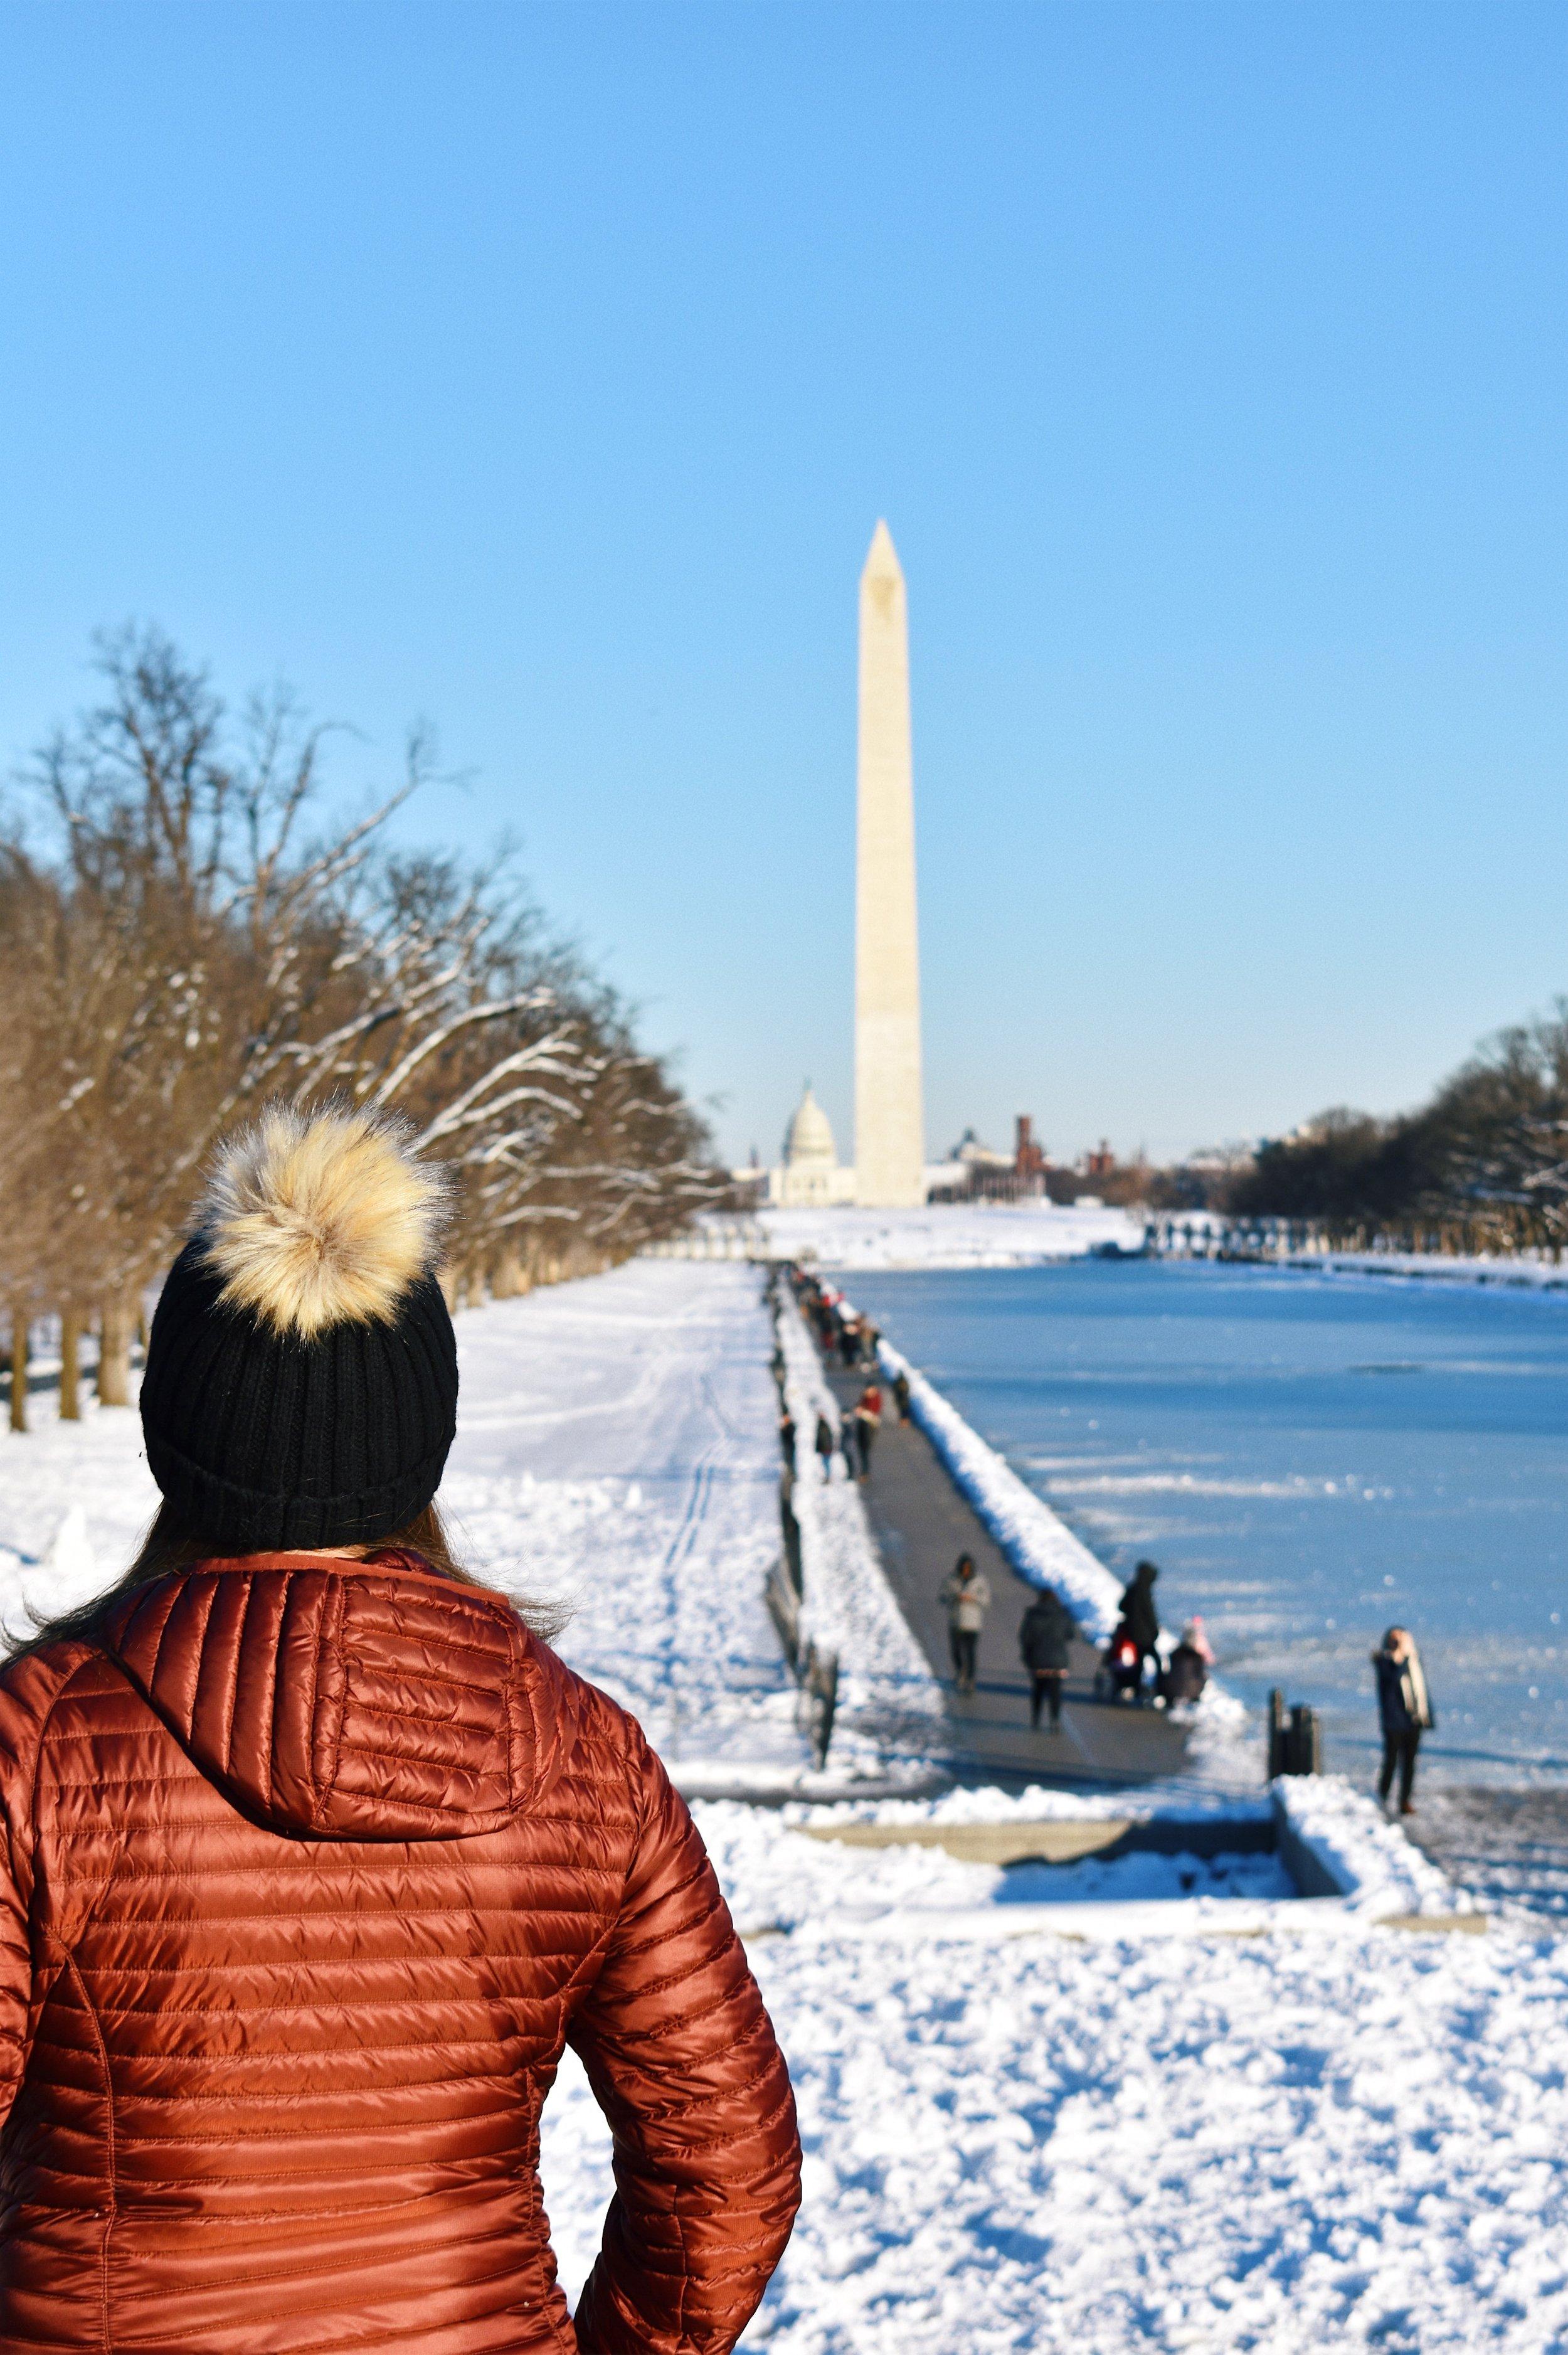 Snow Day in Washington D.C.